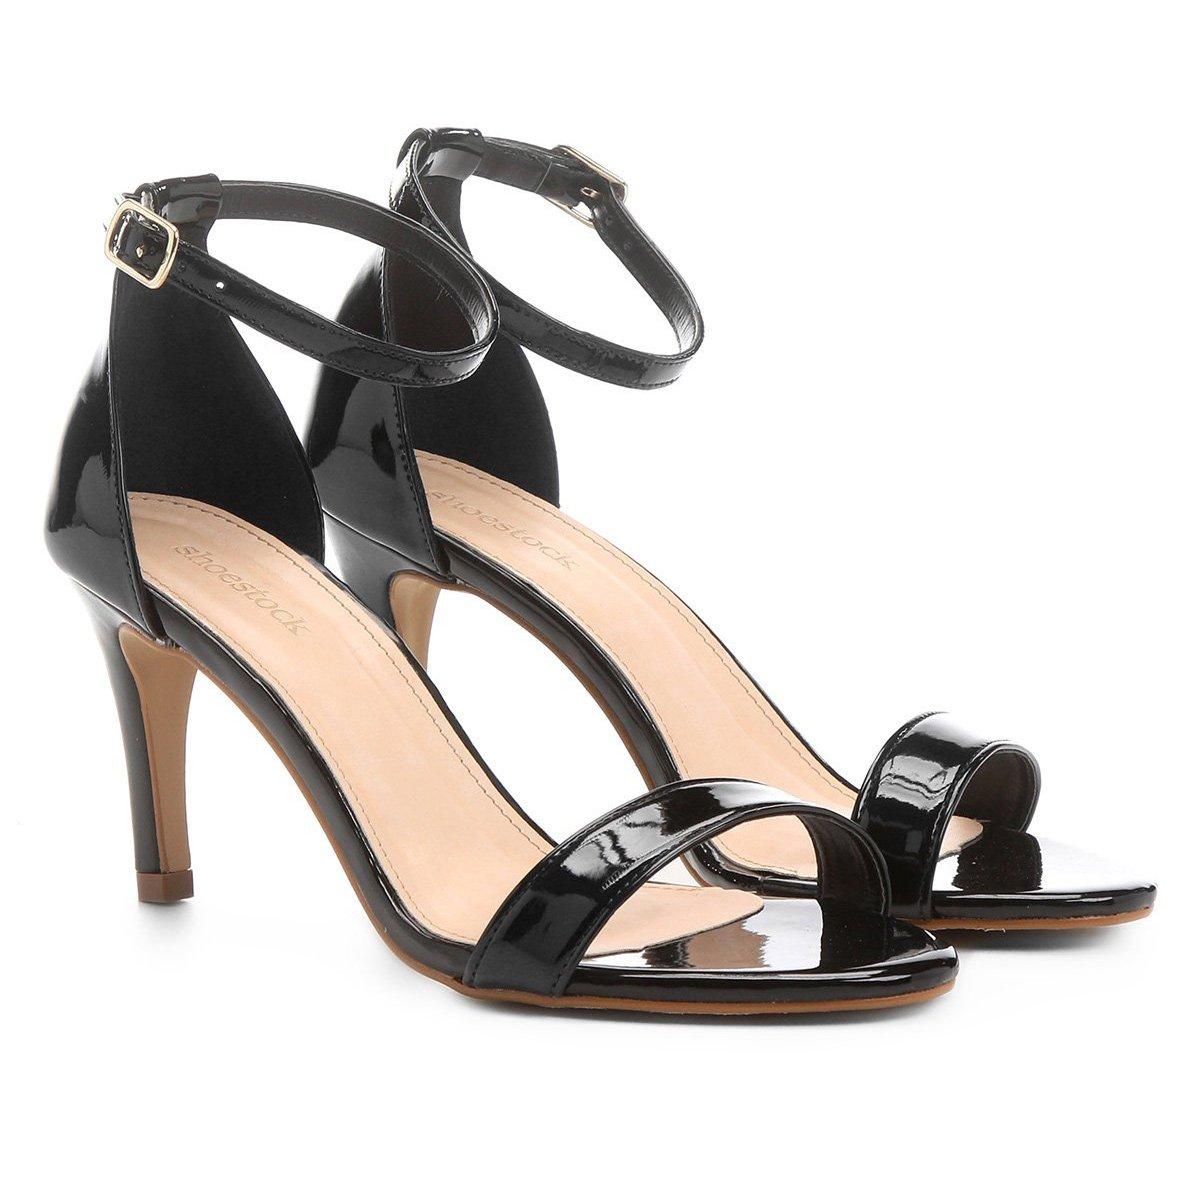 290e394a6 Sandália Shoestock Naked Salto Fino Verniz Feminina